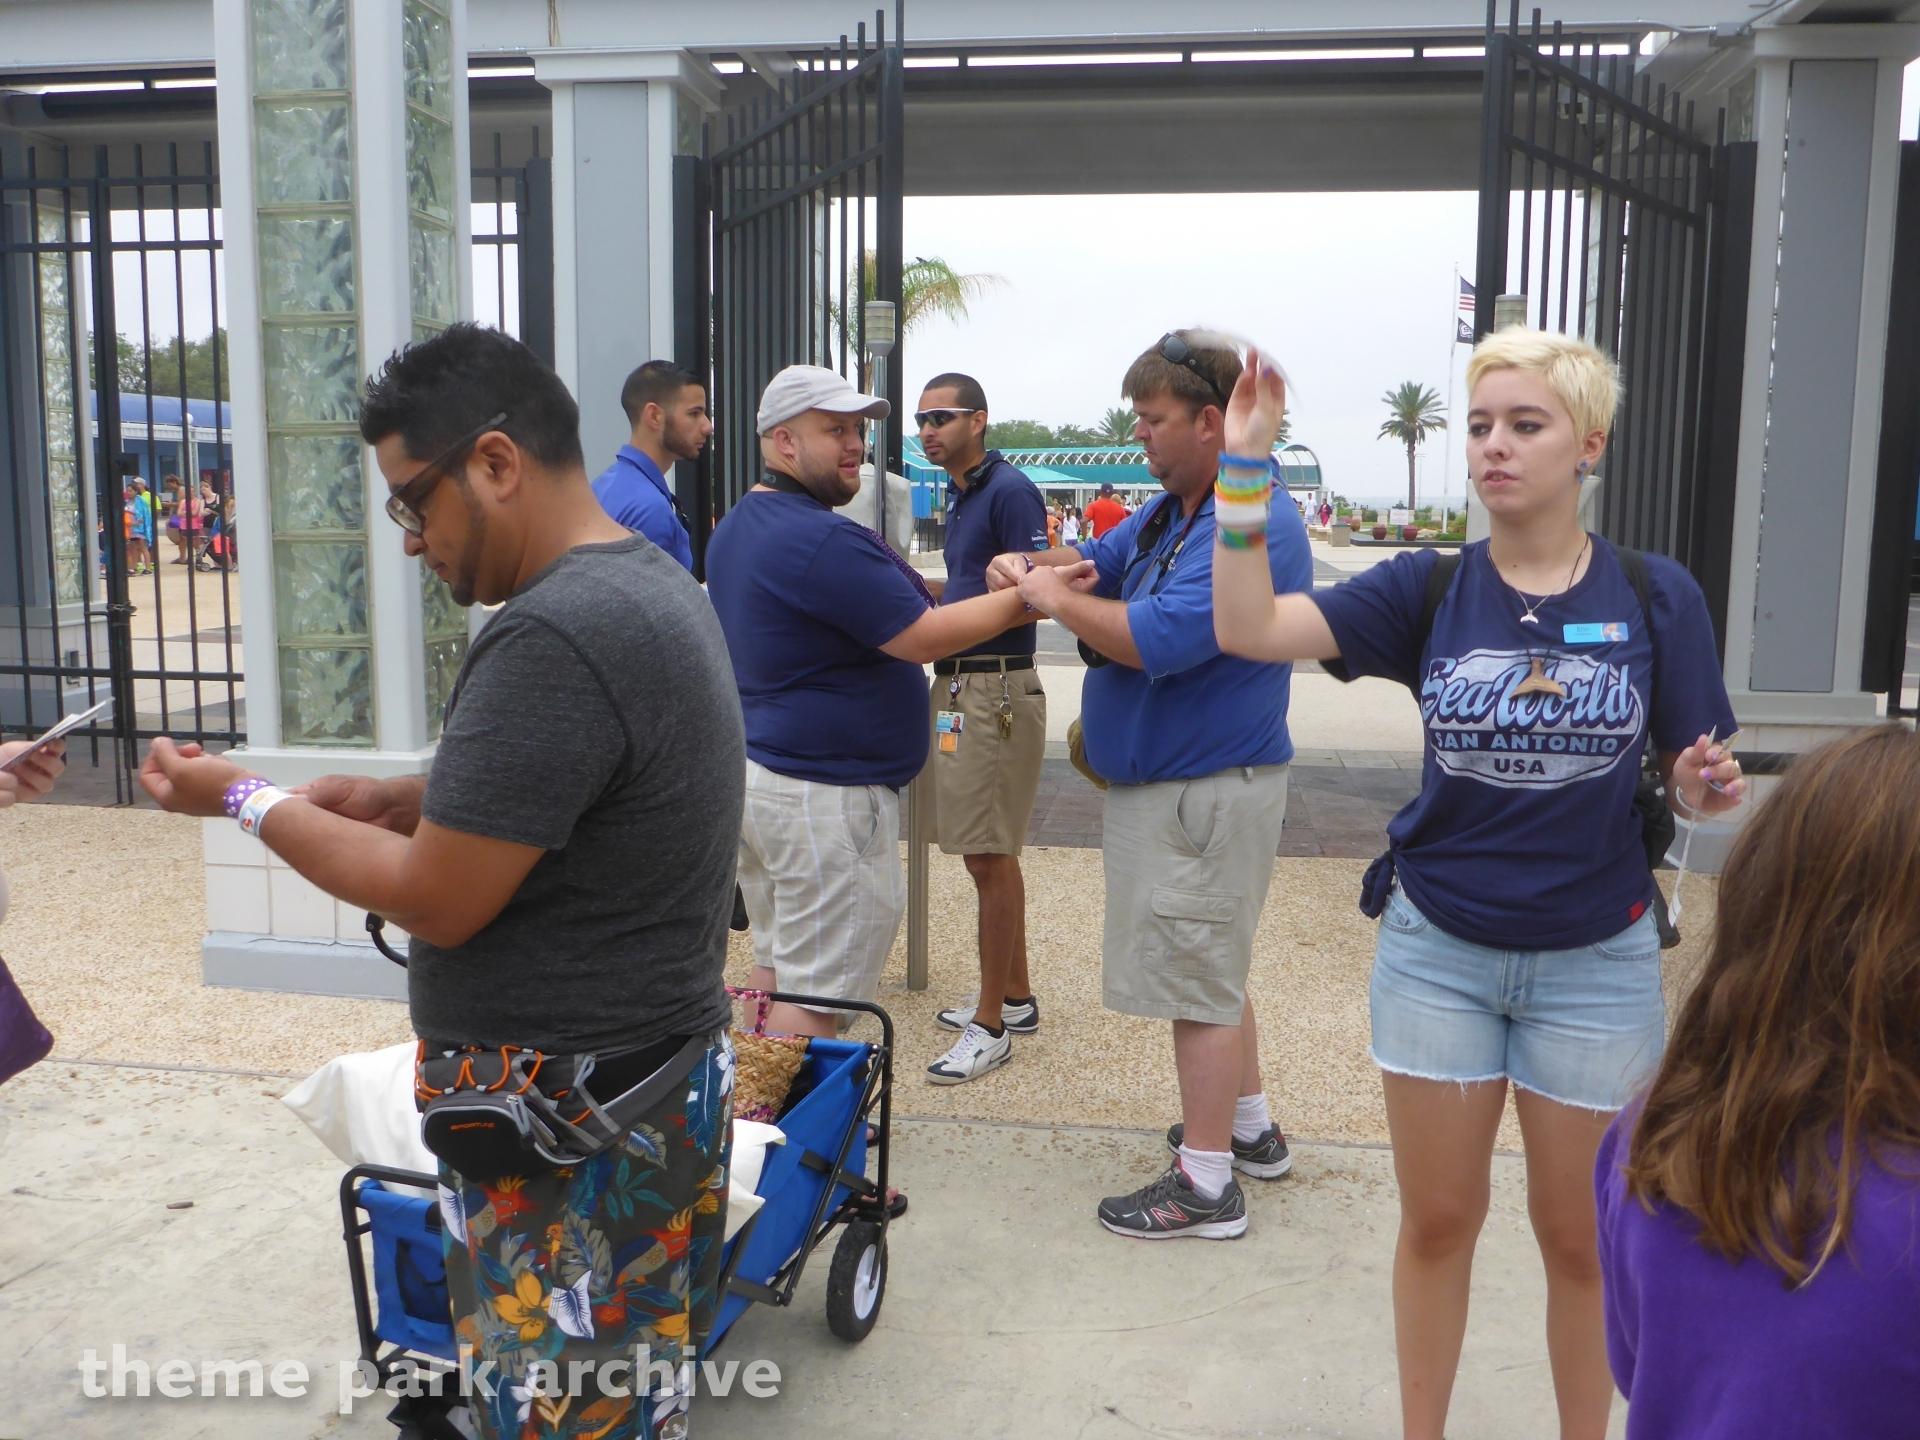 Entrance at SeaWorld San Antonio